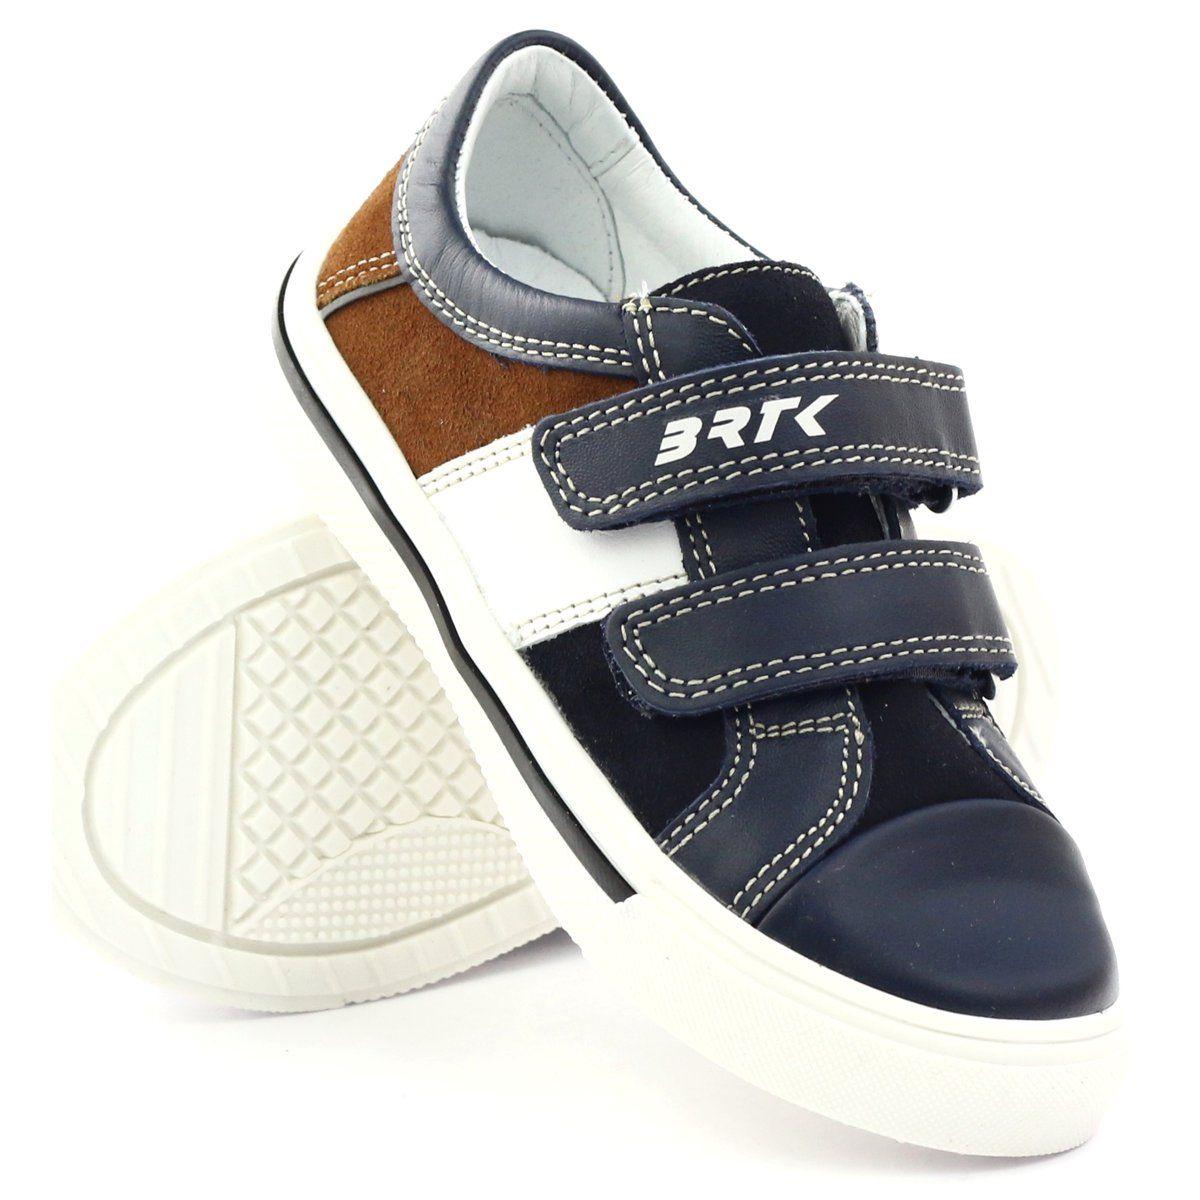 Polbuty Chlopiece Bartek 15607 Granatowe Wielokolorowe Brazowe Biale Boys Shoes Childrens Shoes Shoes